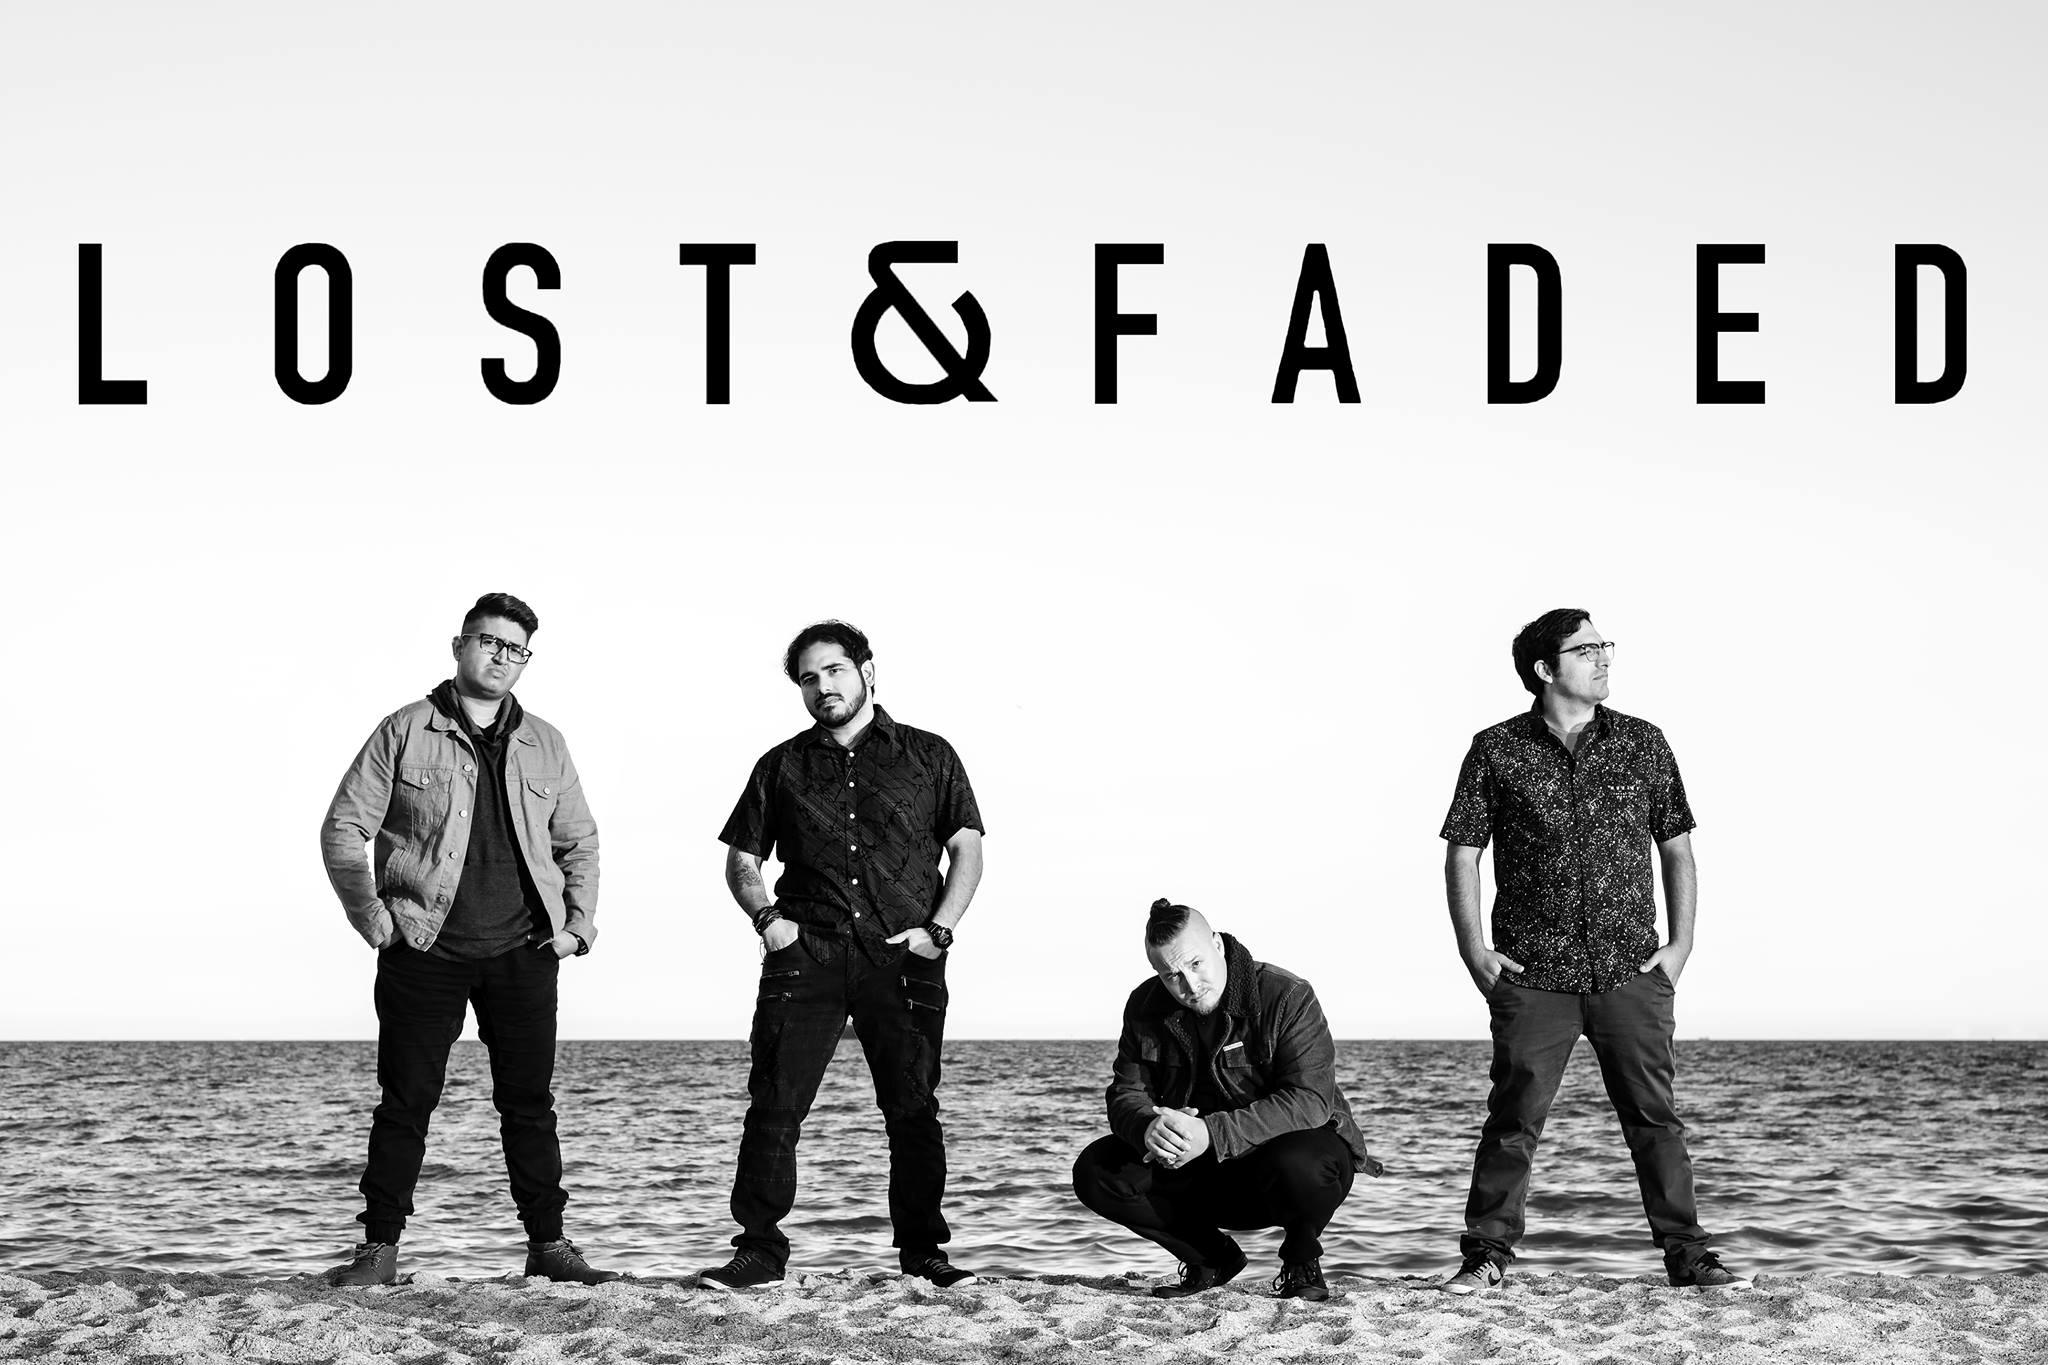 Lost & Faded